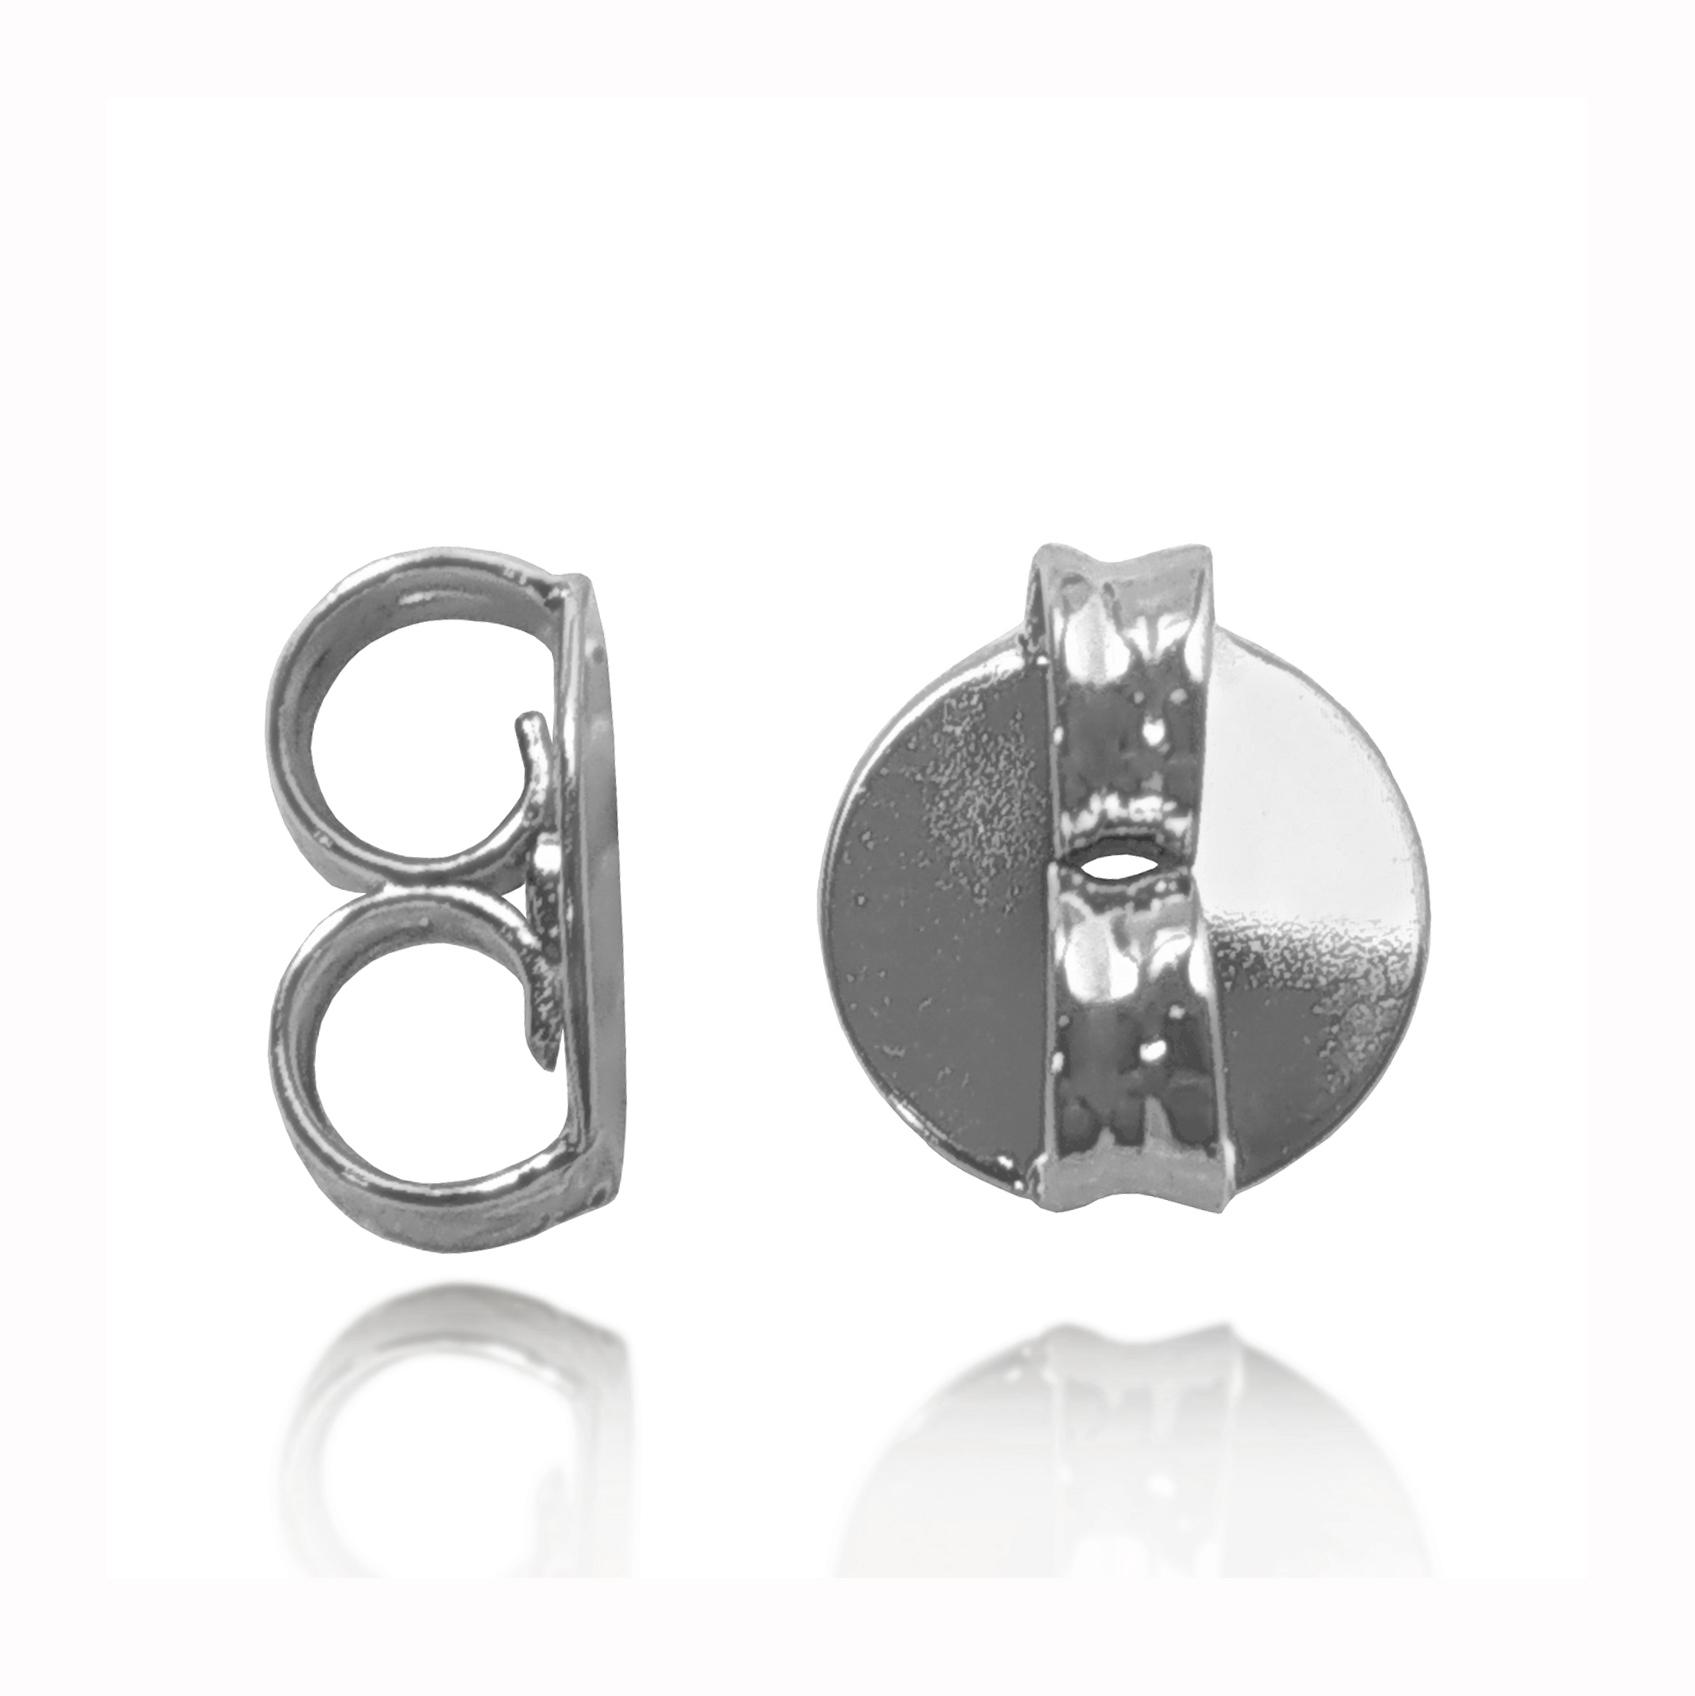 Tarraxa Média 0,6 mm Folheada a Prata 1000  - Lunozê Joias